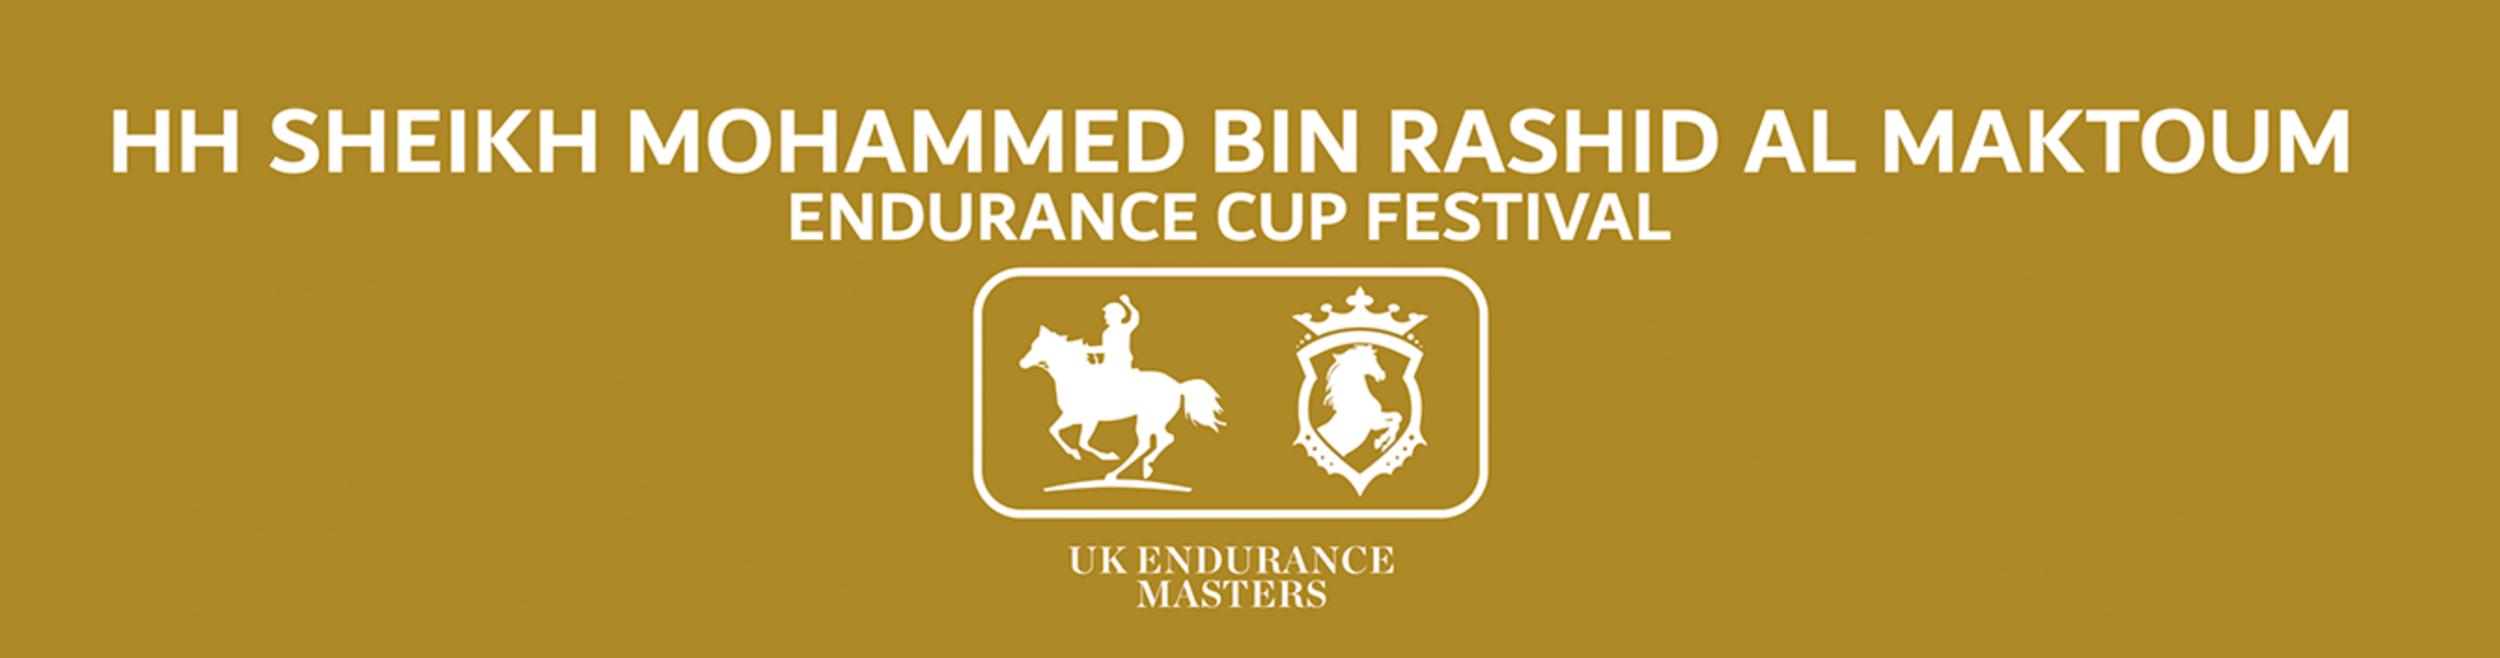 HH Sheikh Mohammed Bin Rashid Al Maktoum Endurance Cup Festival UK Endurance Masters • Euston Park Endurance.png